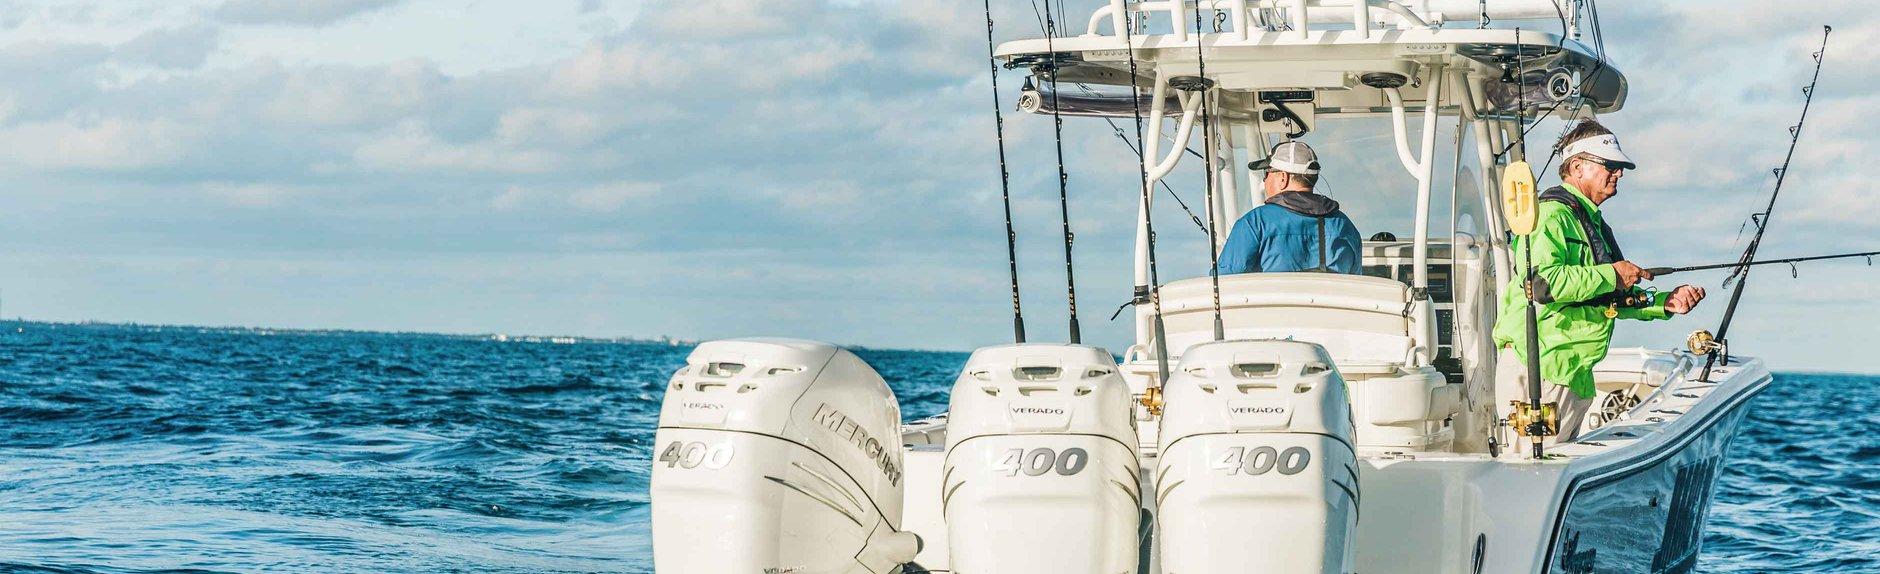 mercury outboard power trim wiring diagram ryobi trimmer fuel line verado 250 400hp marine sign up for email